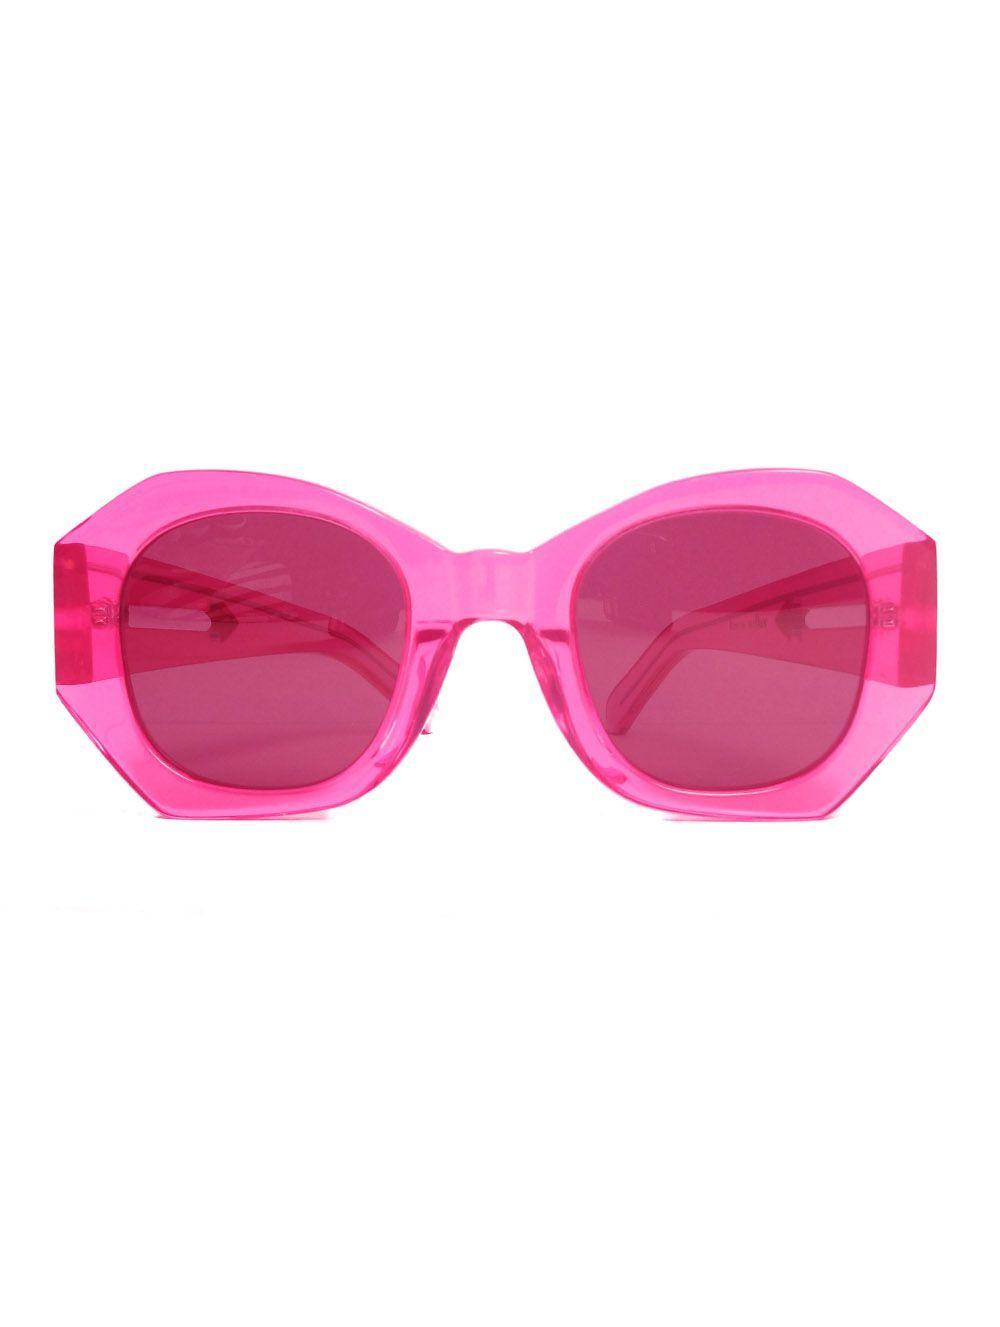 Karen Walker Patsy Sunglasses